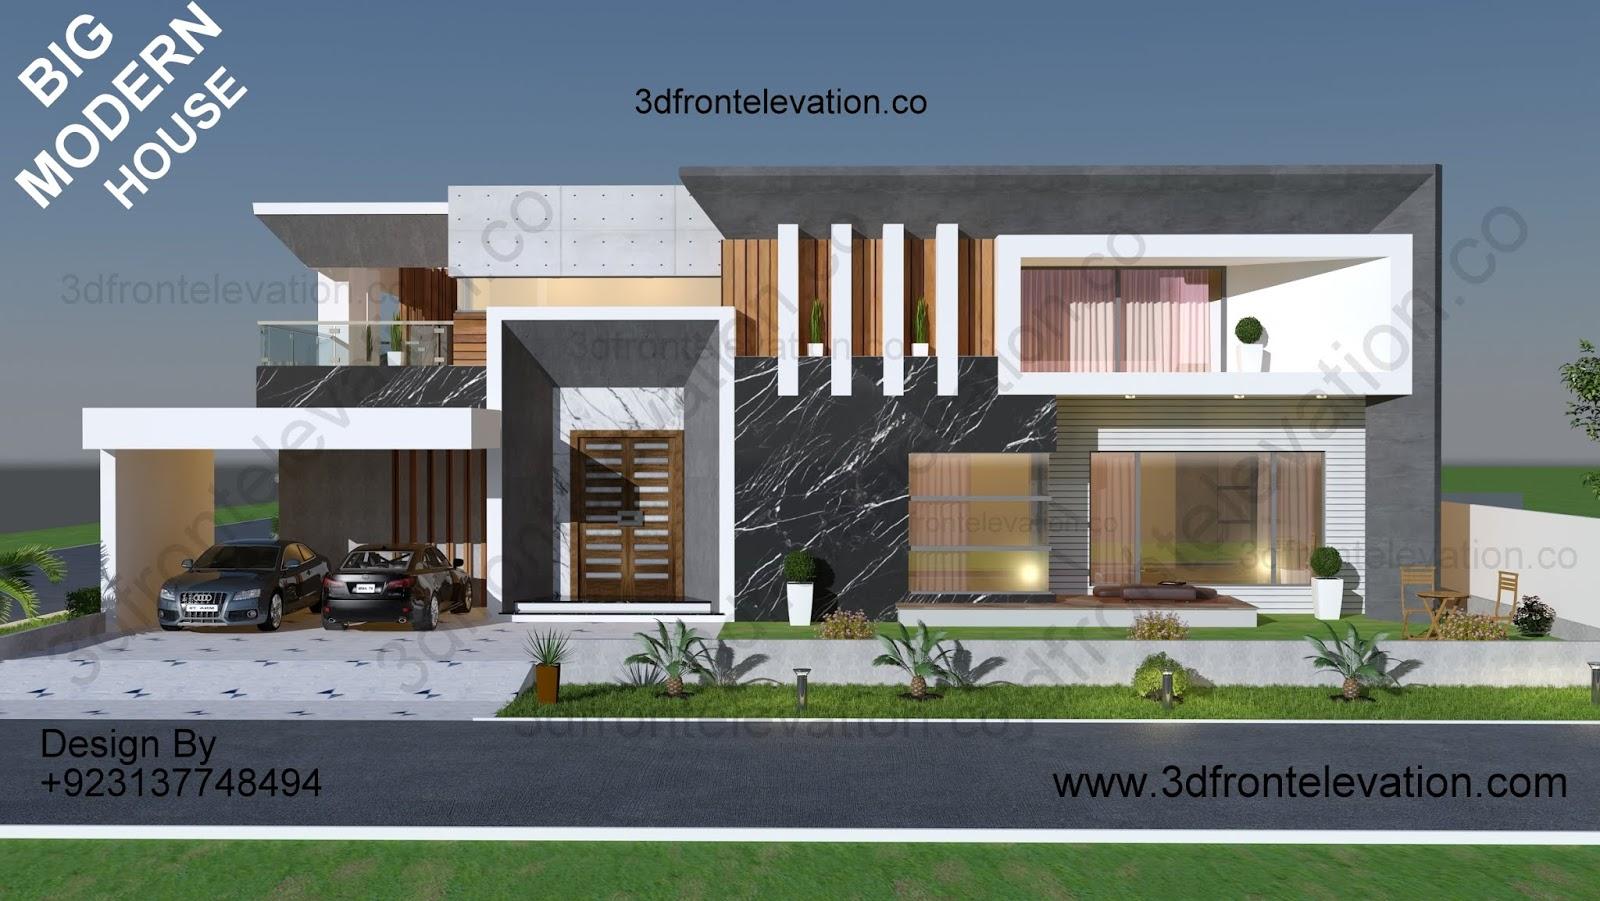 3 SIDE CORNER BIG HOUSE PLAN EXTERIOR ELEVATION DESIGN , COMPLETE ARCHITECTURAL SERVICES